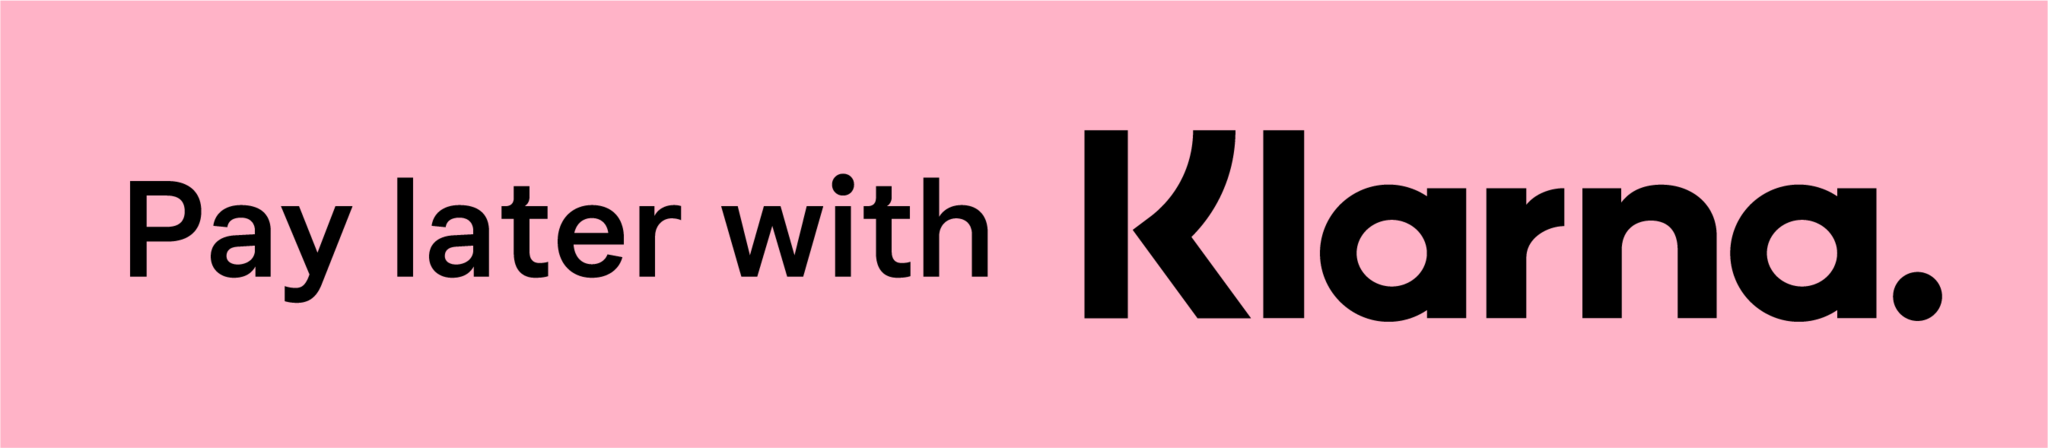 klarna-actionbadge-primary-pink